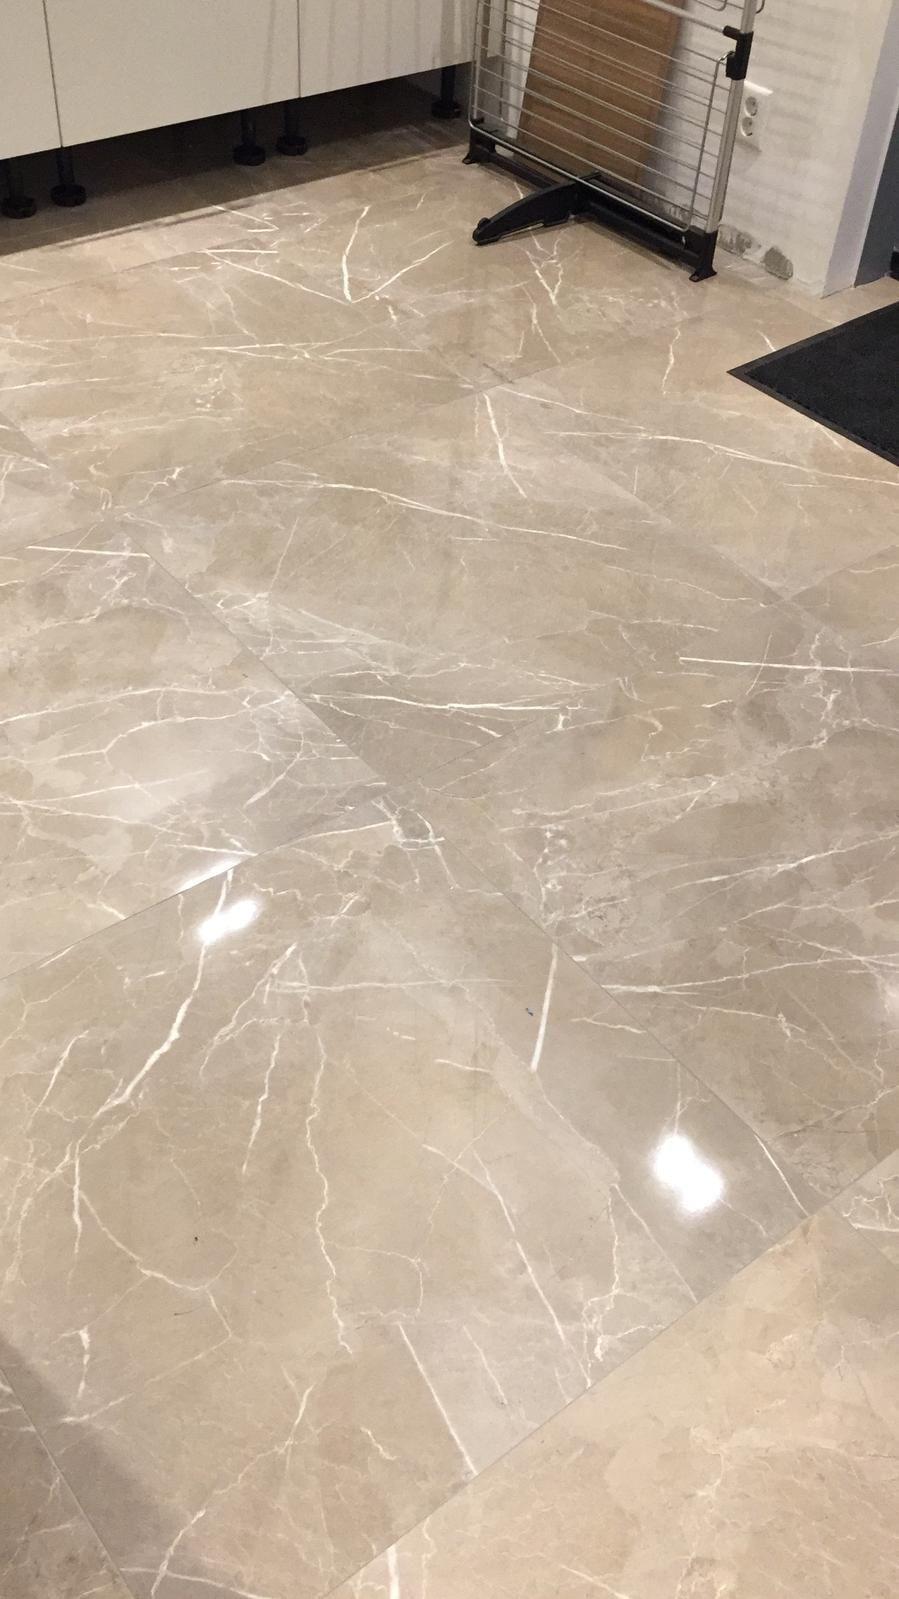 Hoogglans Vloertegel 80x80 Cm Marmerlook Taupe A79 Rb Tegels Tiel Floor Tile Design Living Room Tiles Floor Design